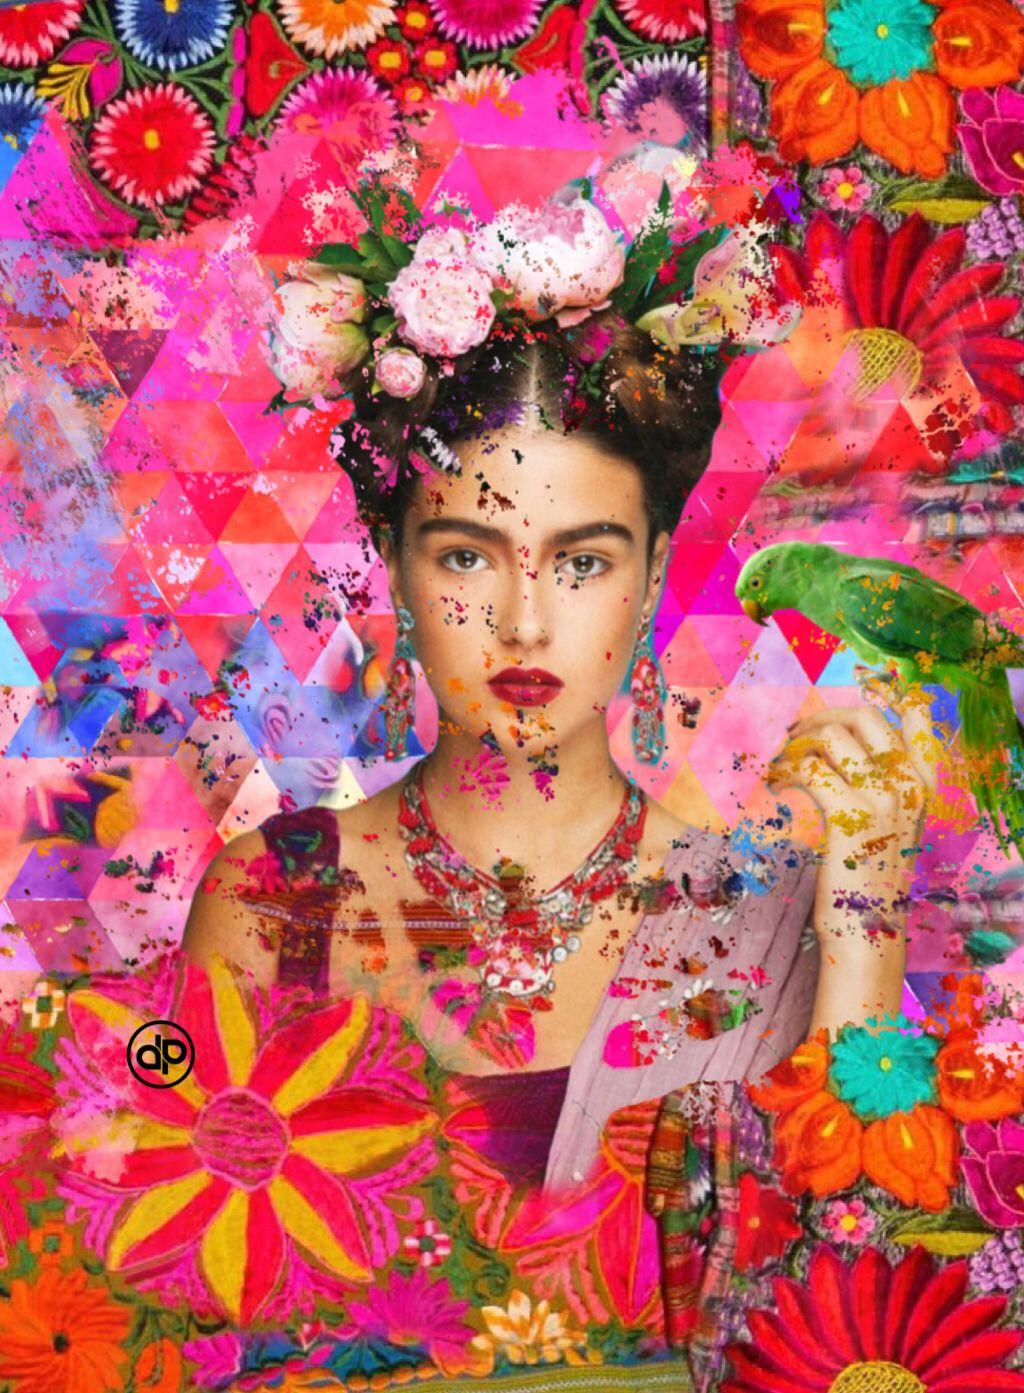 Fractured Frida. #digitalcollage #digital art #collage #instart ...